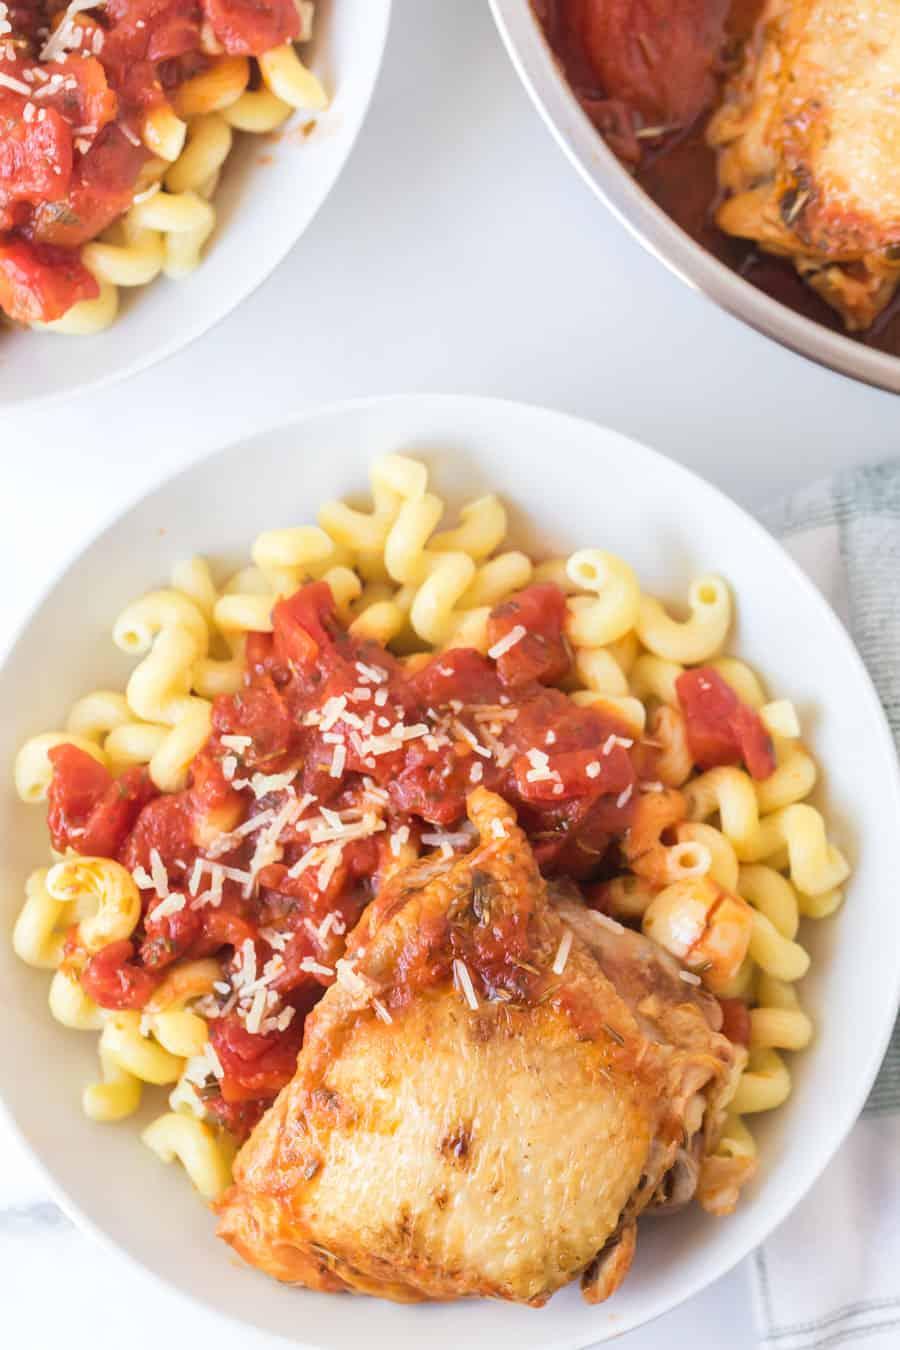 tomato and garlic cavatappi pasta with chicken thigh in white bowl